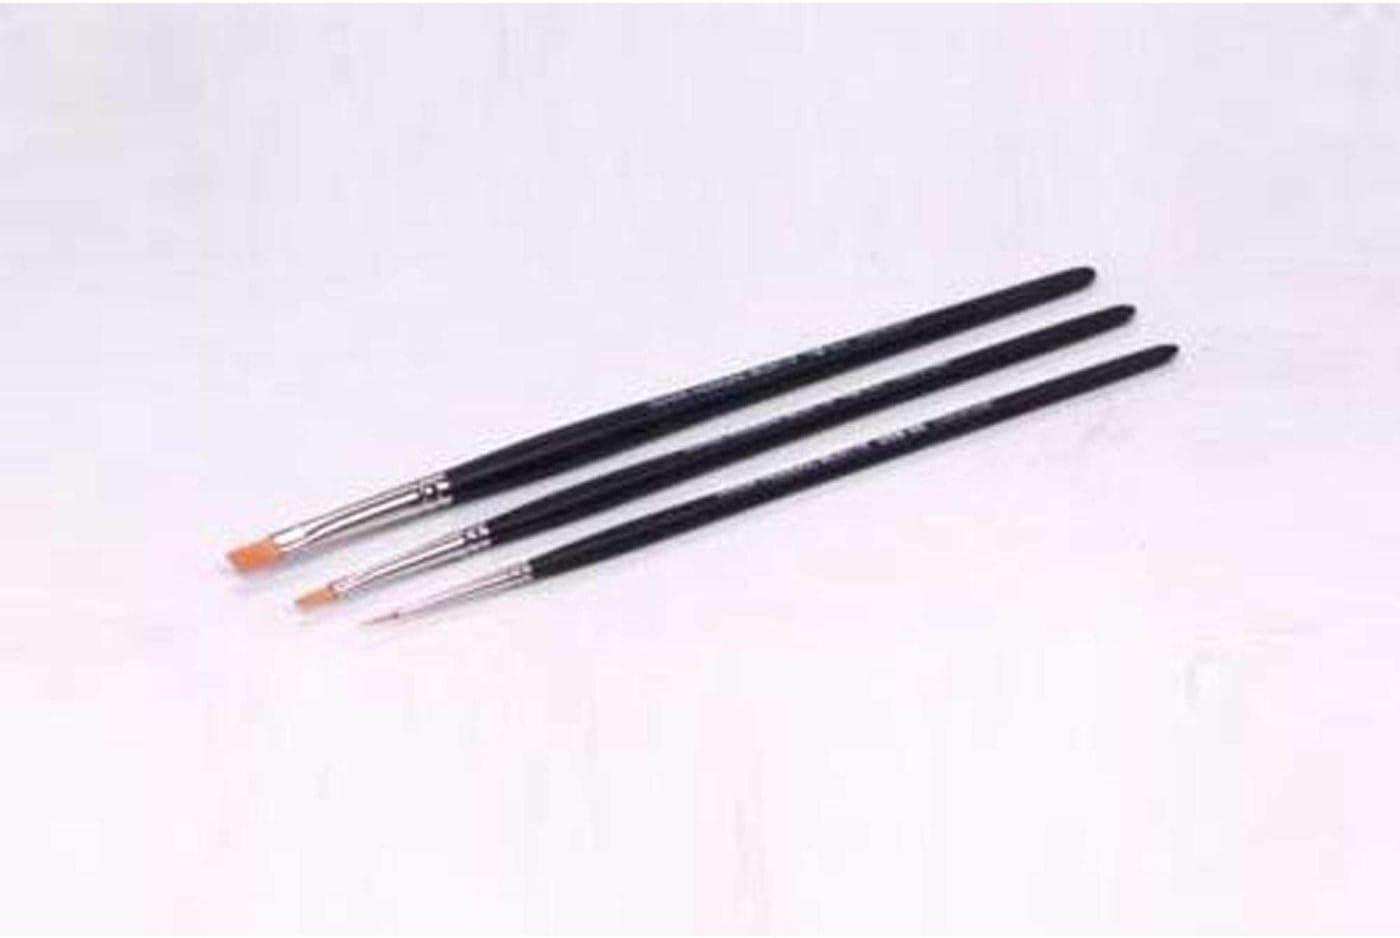 Tamiya Models Modelling Brush HF Standard Set 3 different Brushes